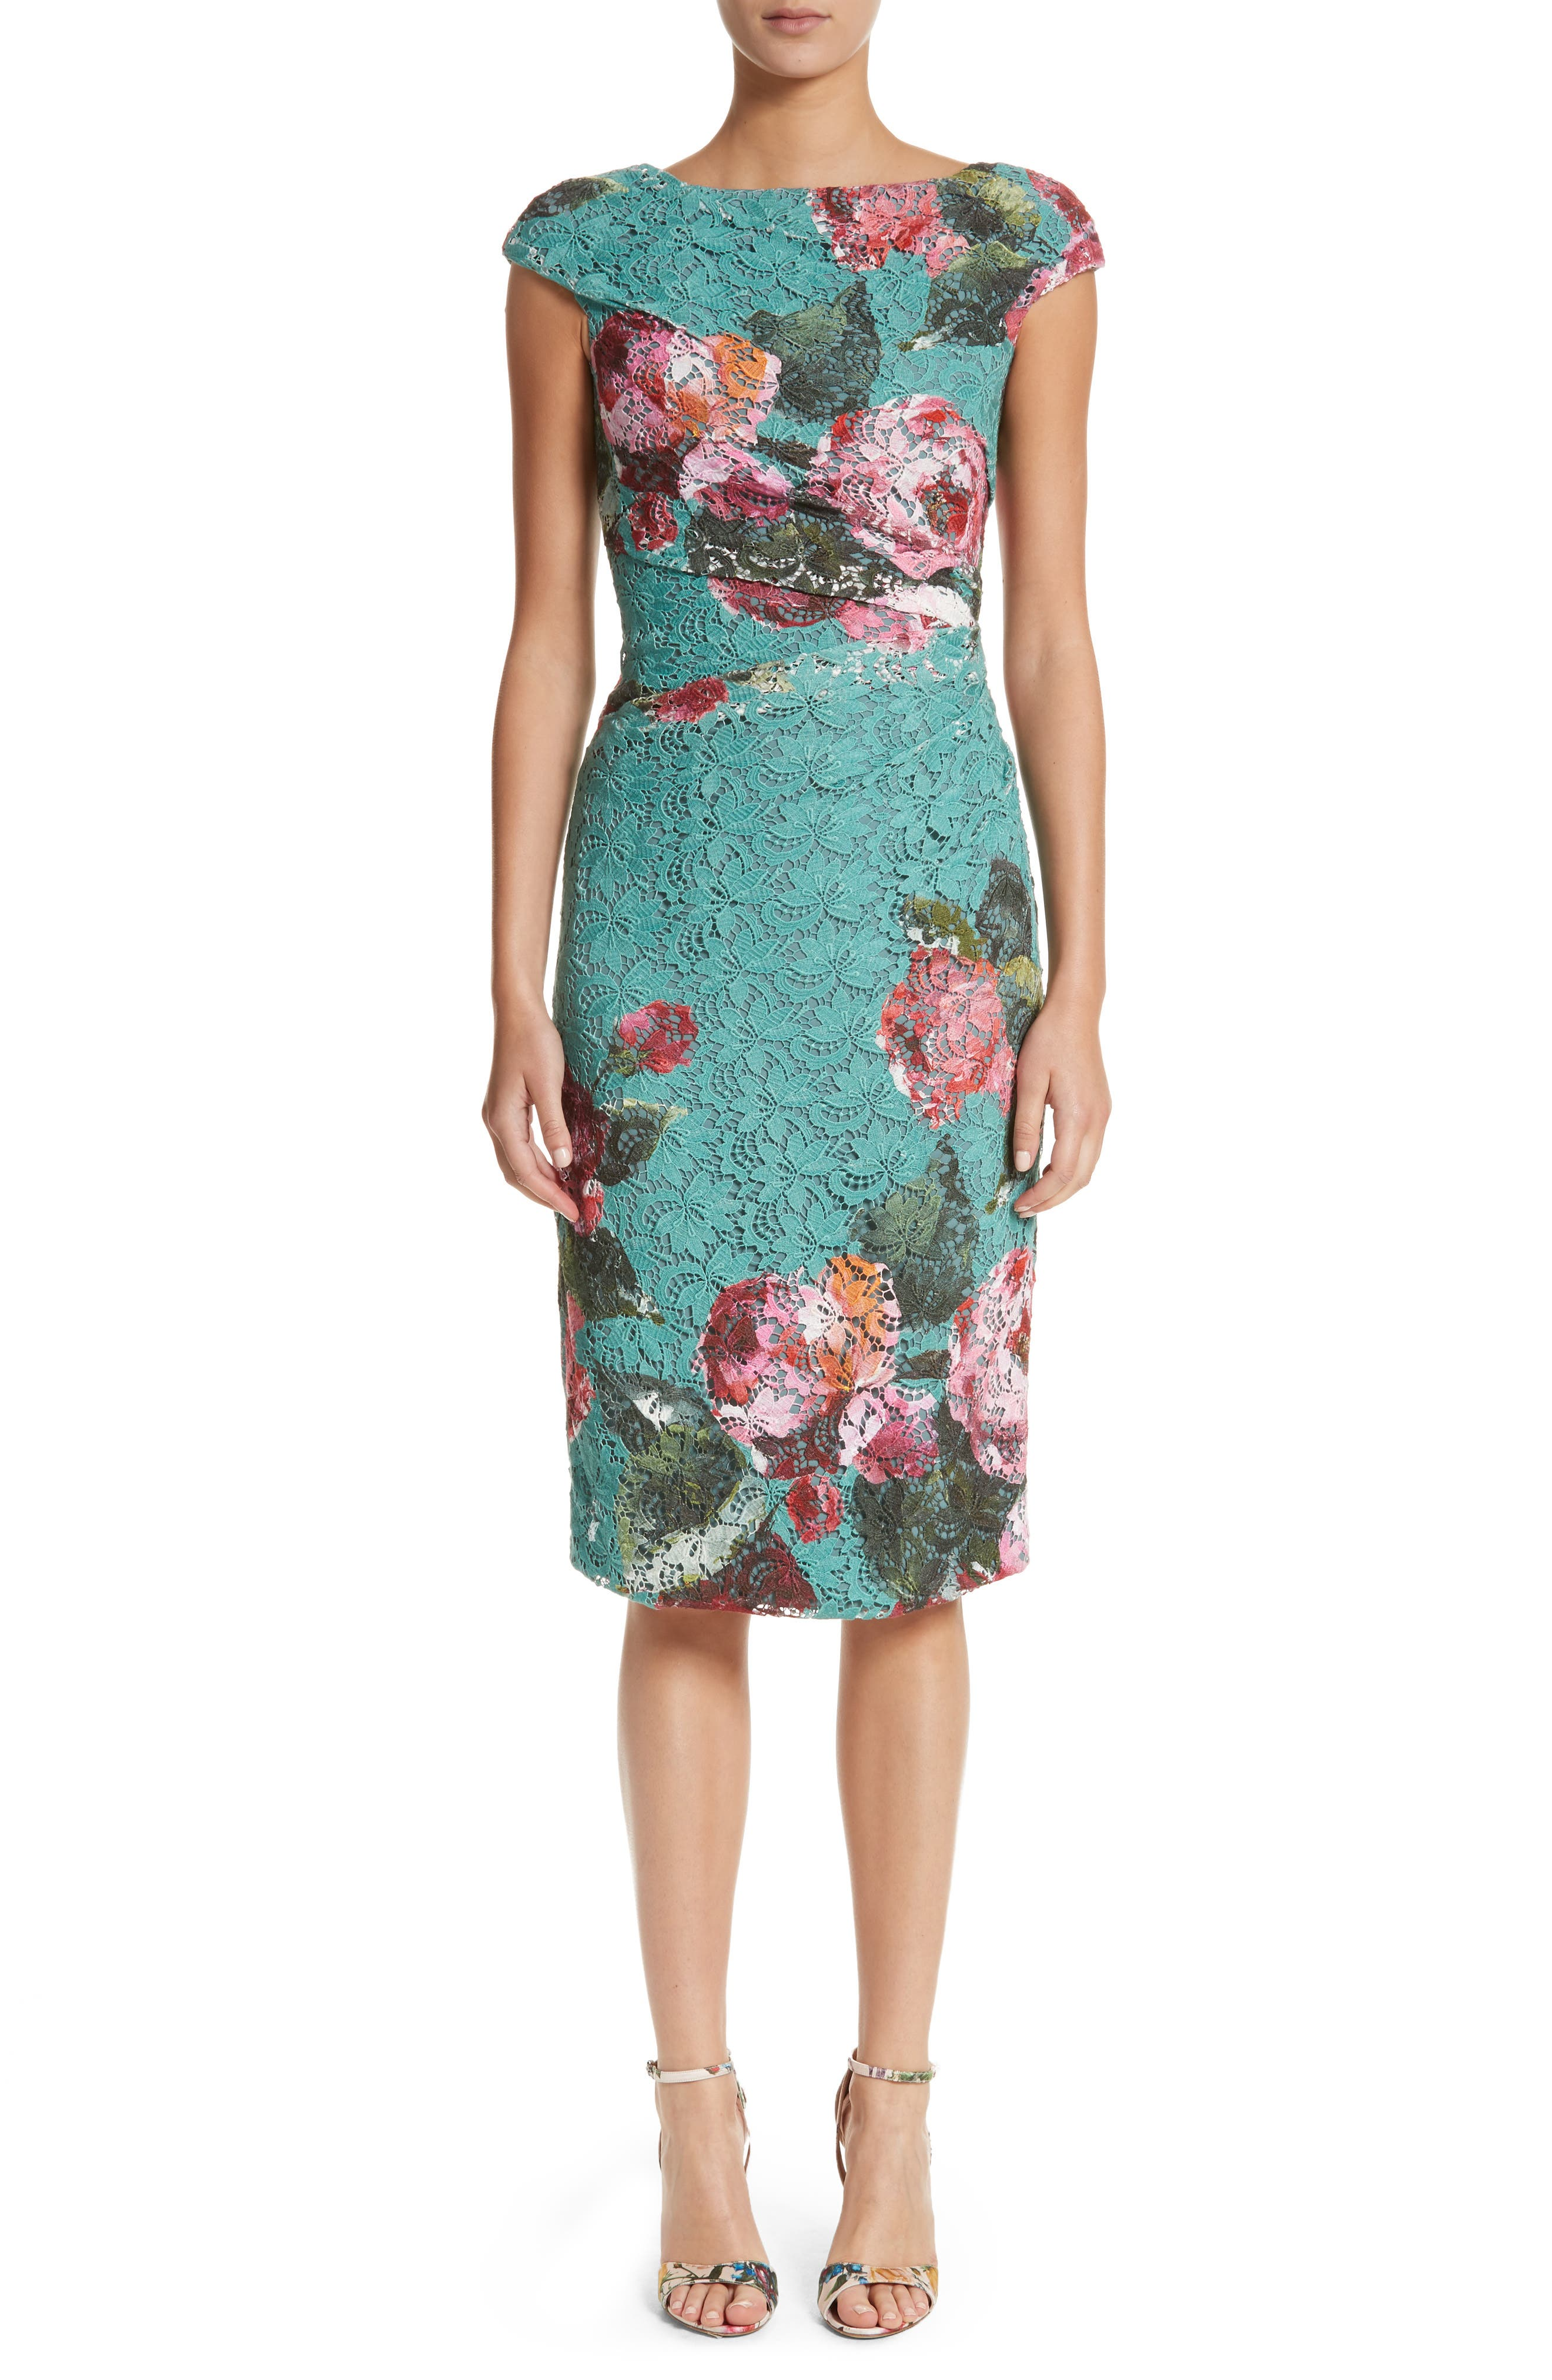 Alternate Image 1 Selected - Monique Lhuillier Rose Print Guipure Sheath Dress